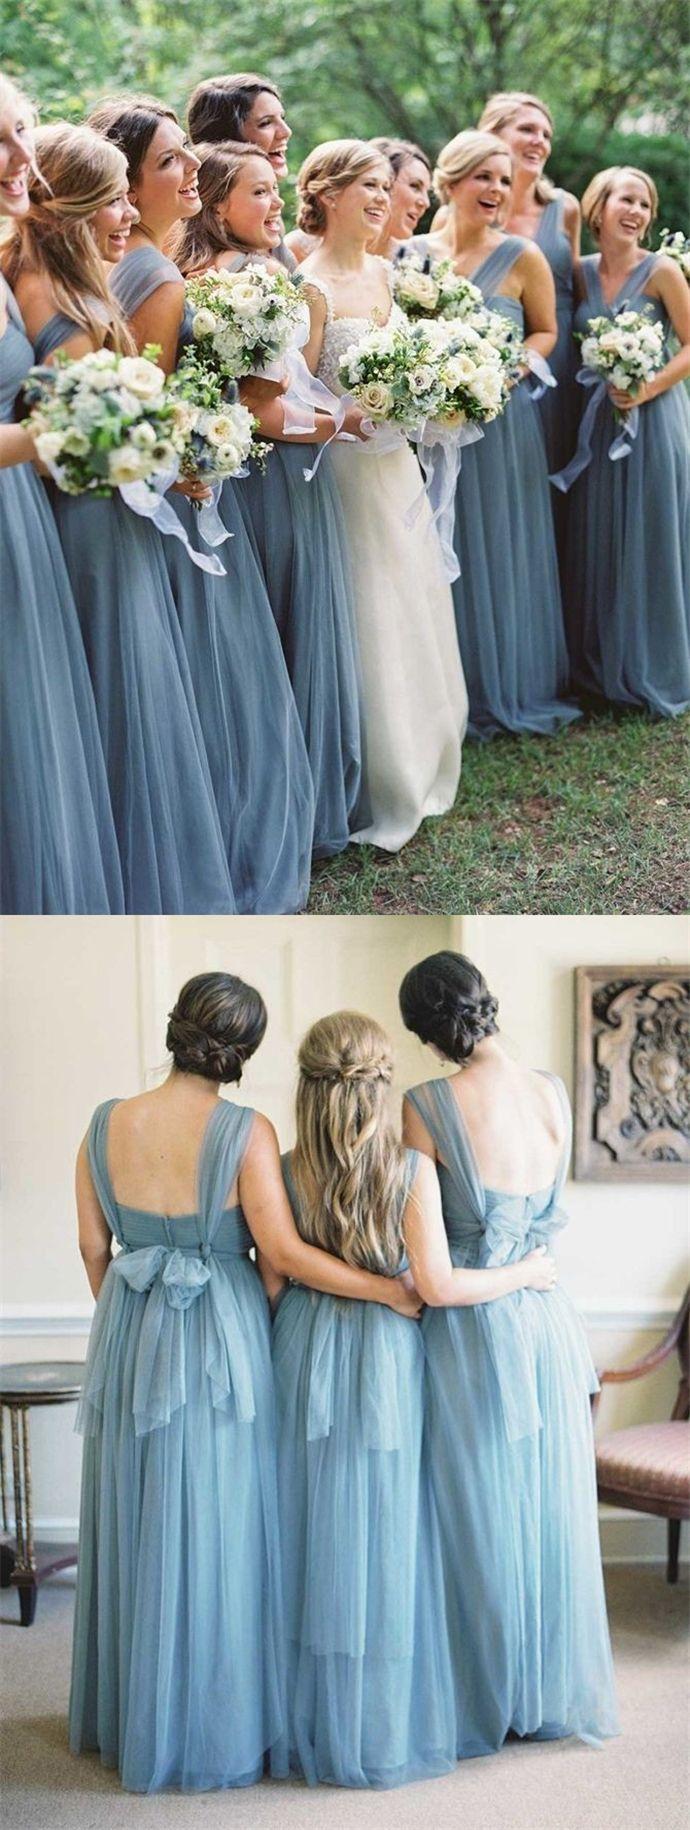 Aline vneck floorlength backless dark blue tulle bridesmaid dress